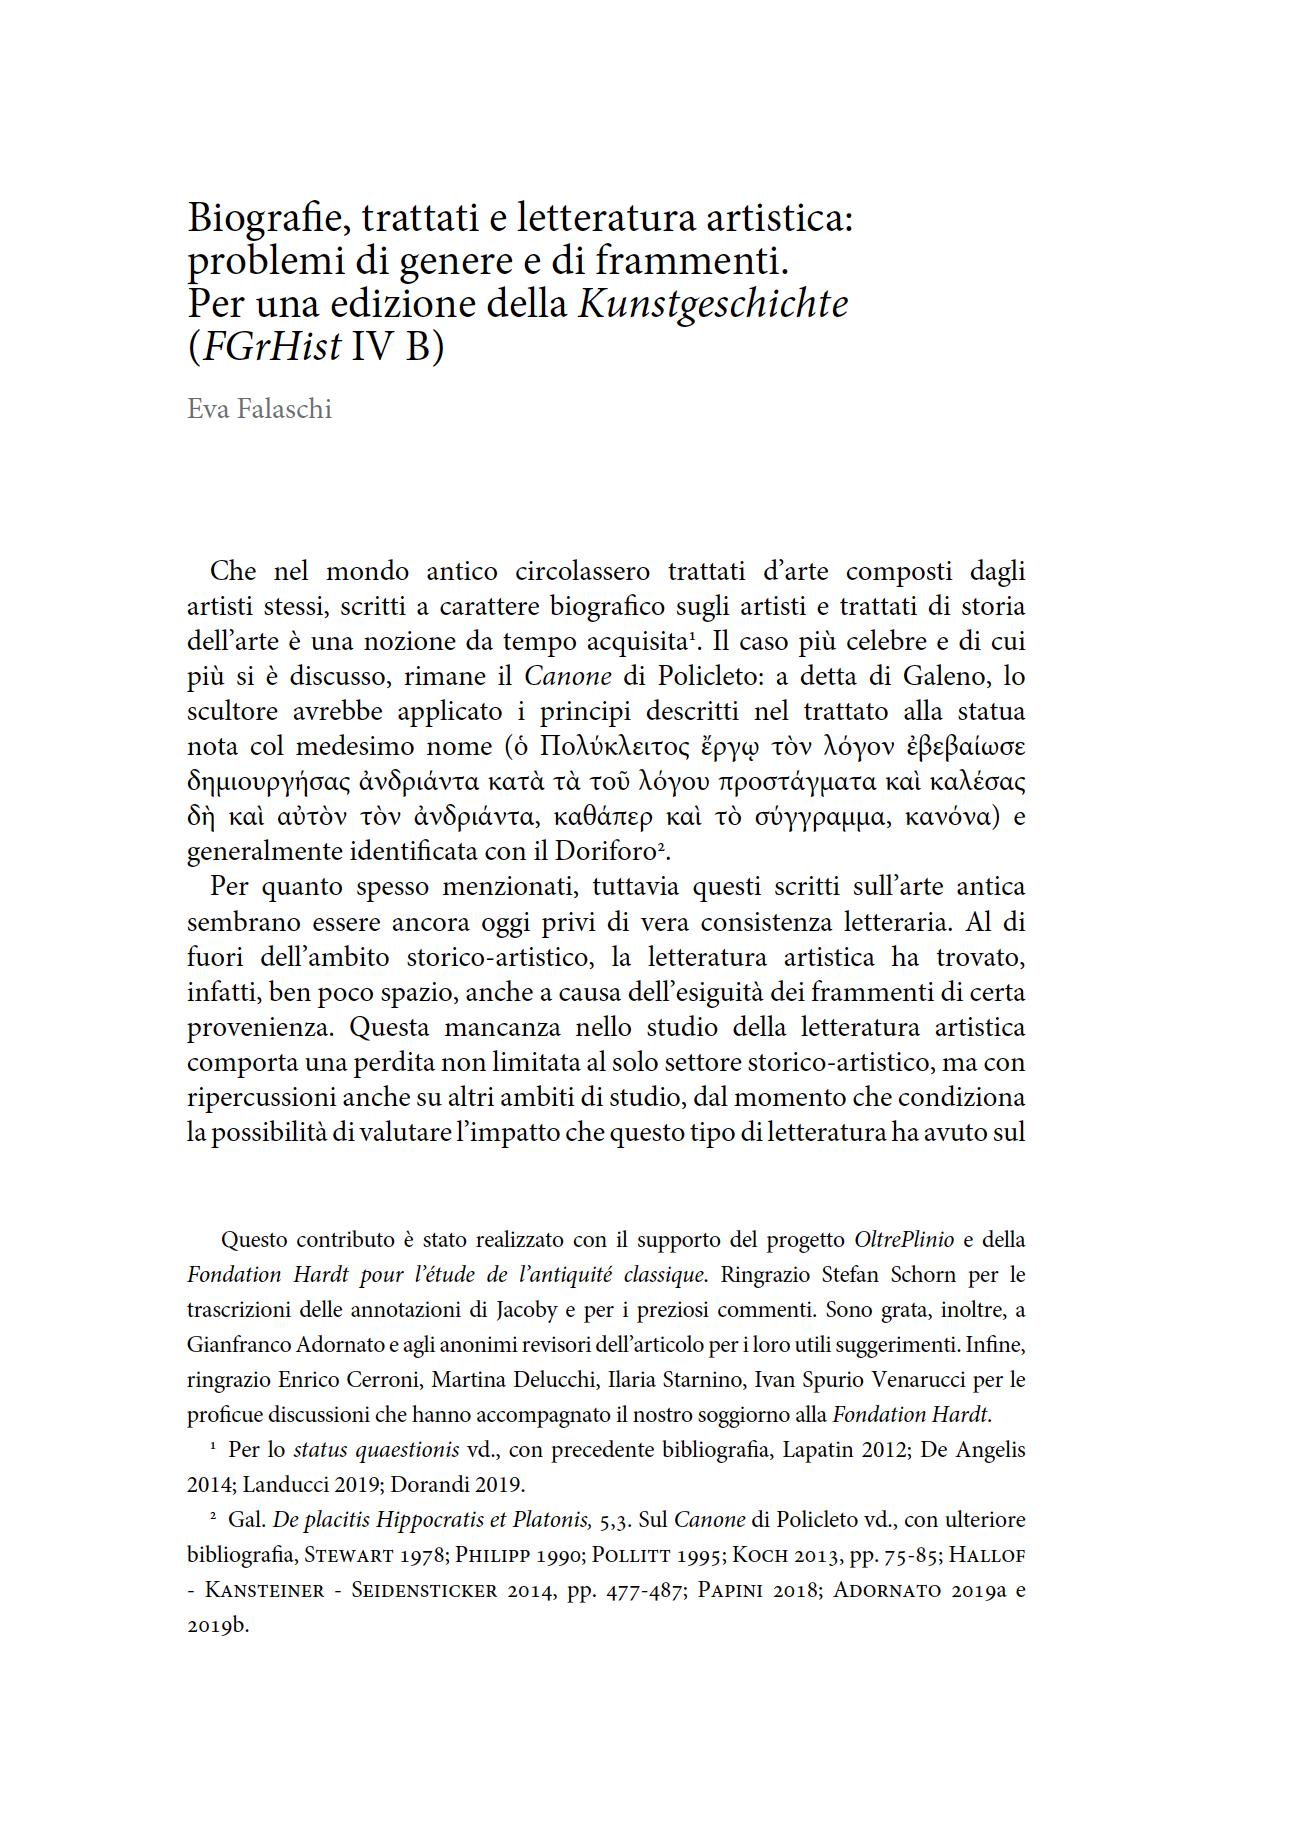 Greek artists, Biography, Artistic Literature